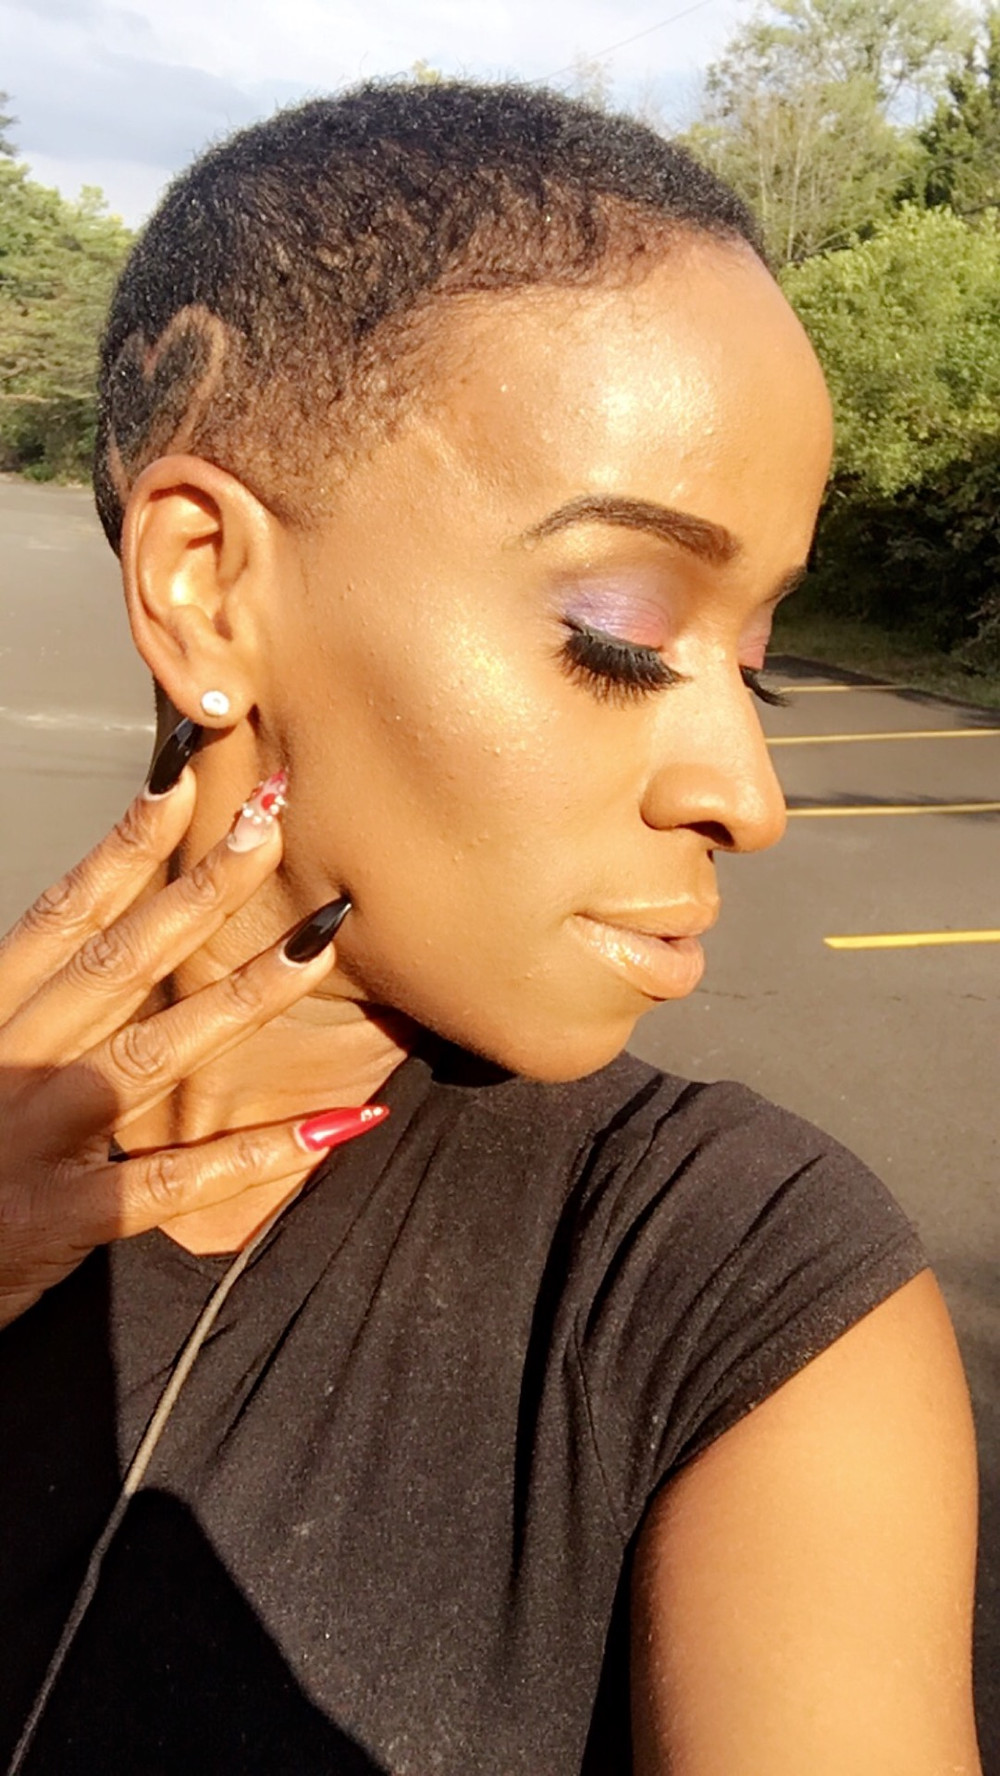 BoojiBEE Makeup using Wet 'n' Wild Astro lipgloss.